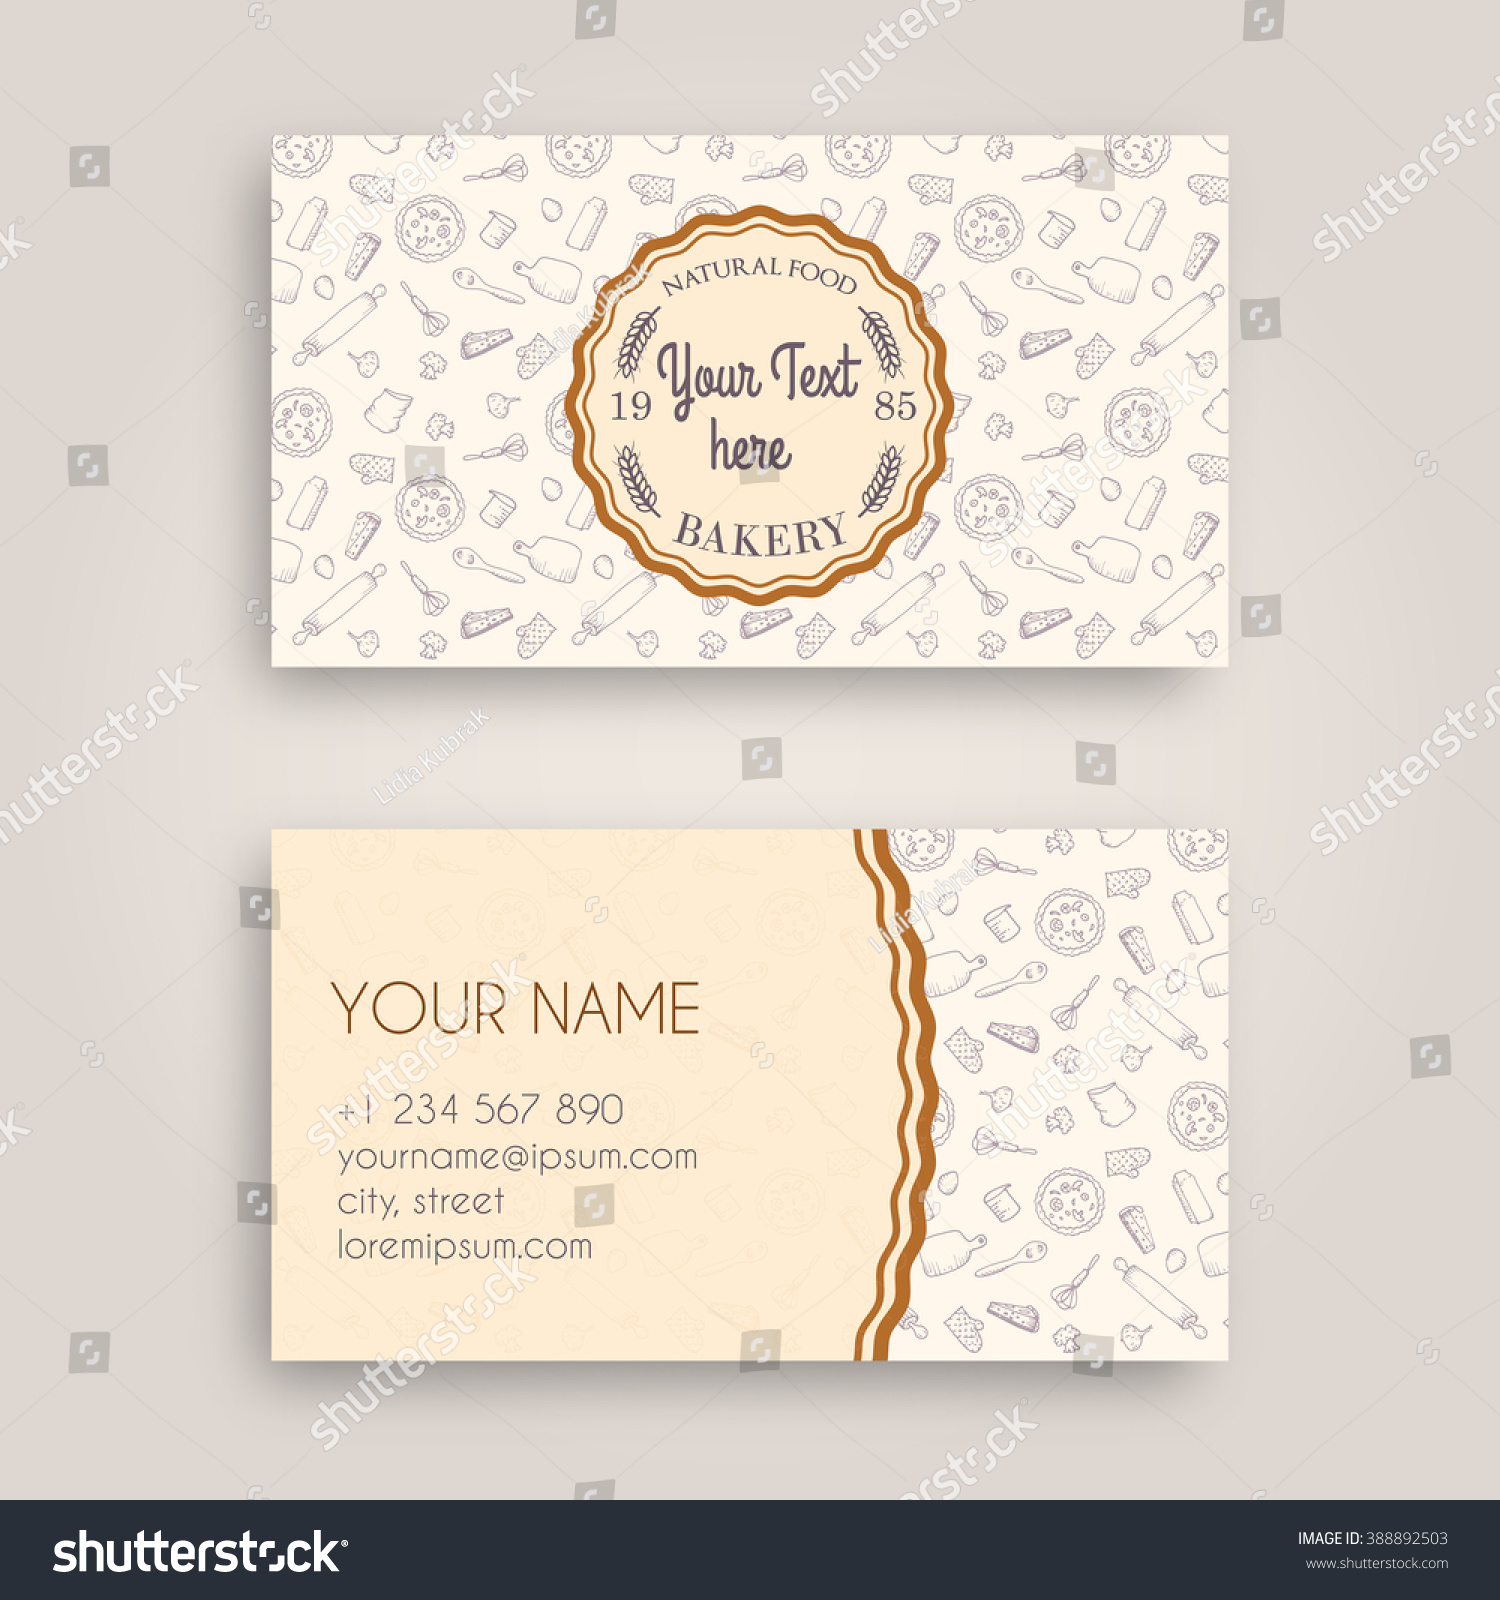 Vector Business Card Design Template Doodle Stock Vector (2018 ...